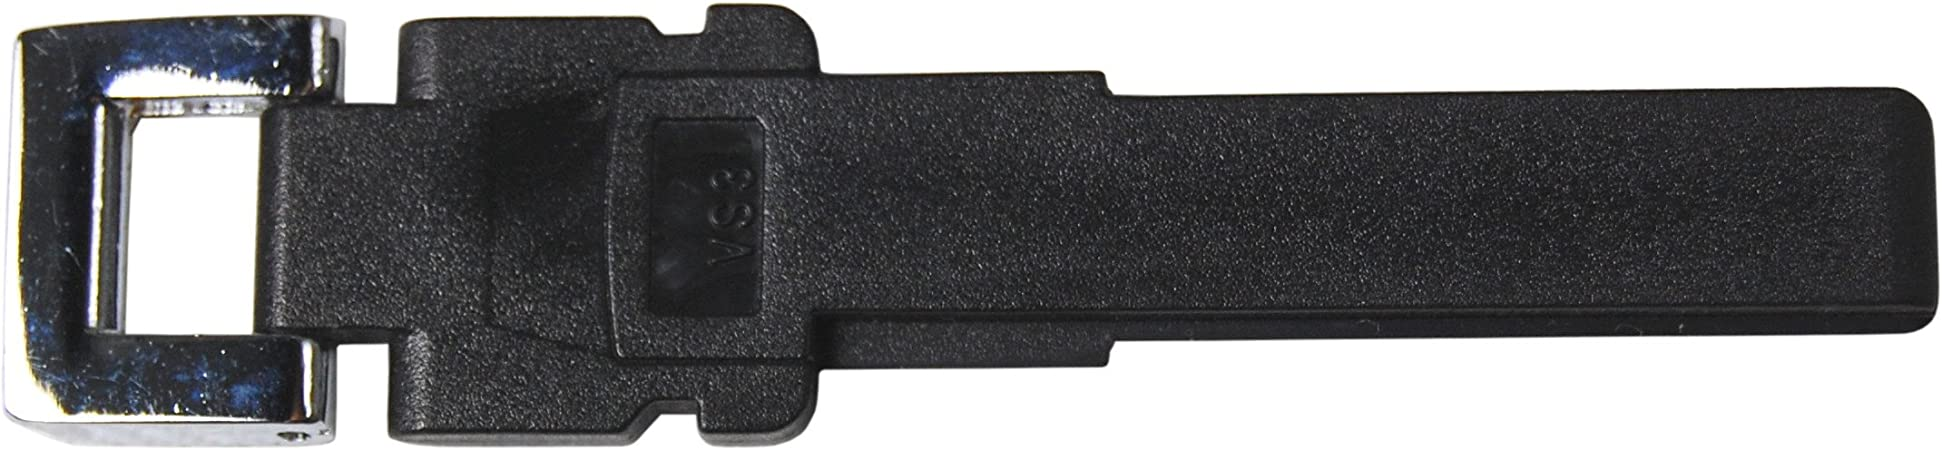 HQRP Blade Blank Insert Smart Remote Spare Key for VW Volkswagen CC 2010 2011